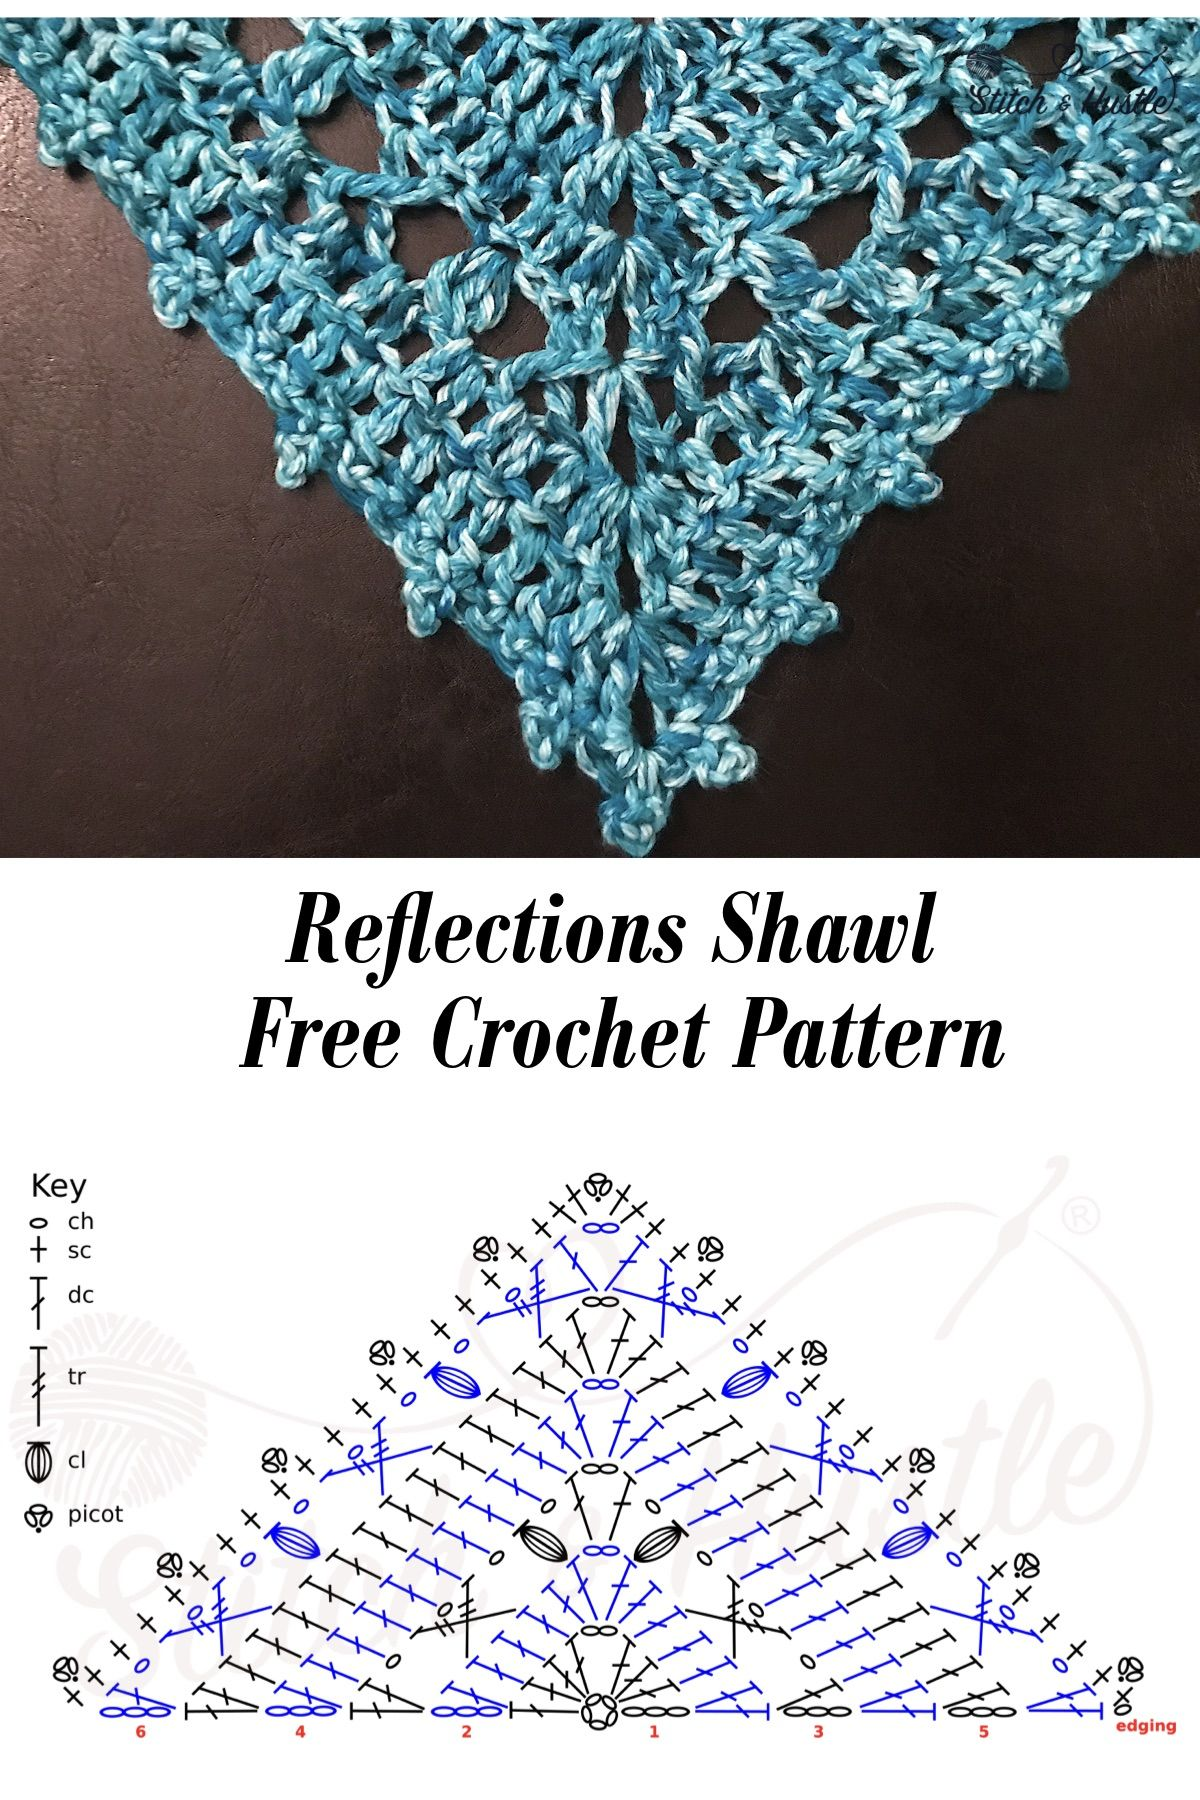 Reflections Shawl Mommy & Me Free Crochet Pattern #shawlcrochetpattern